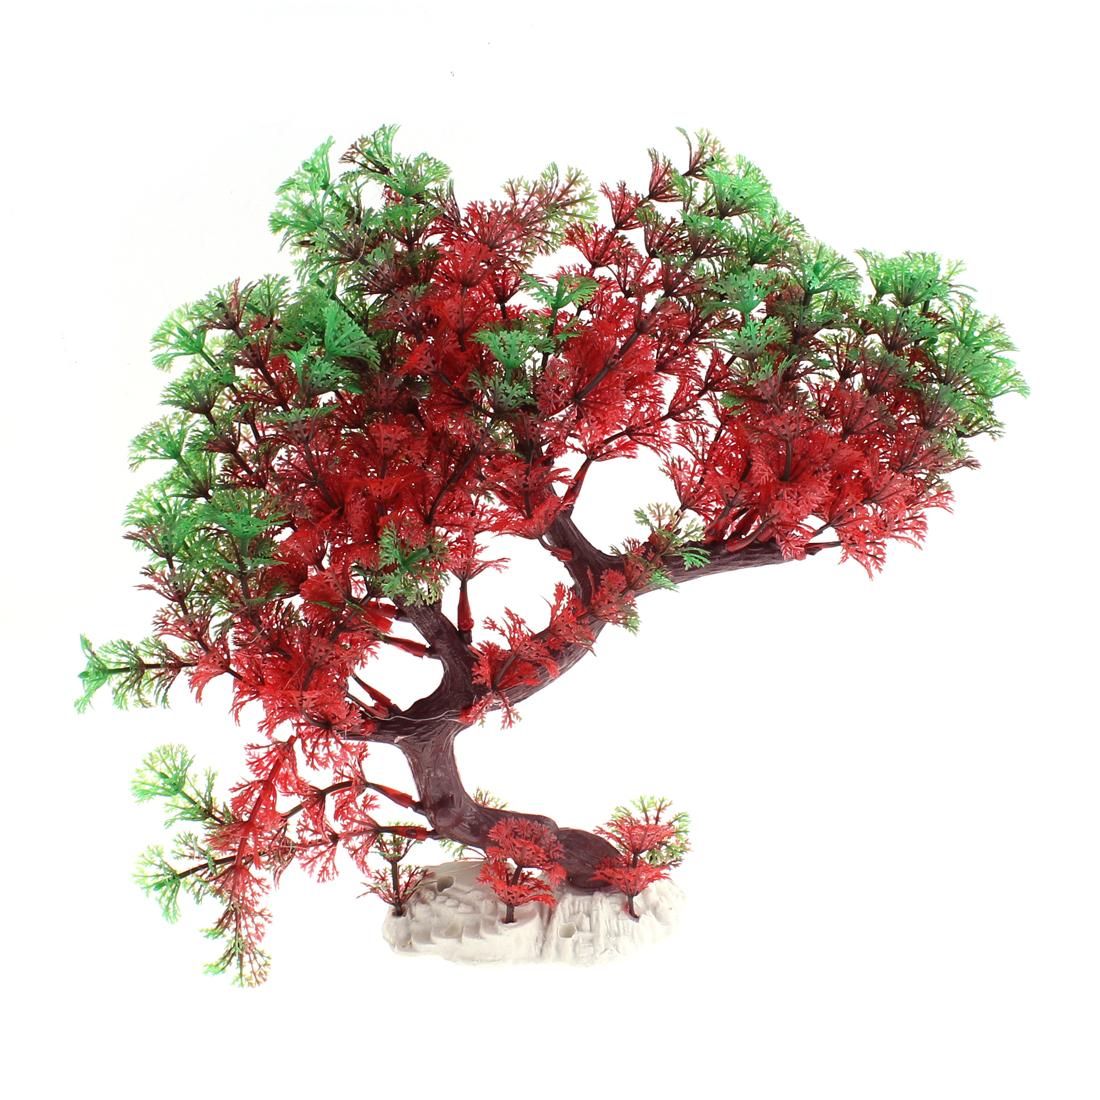 Aquarium Tank Artifical Water Grass Tree Plant Ornament Green Red